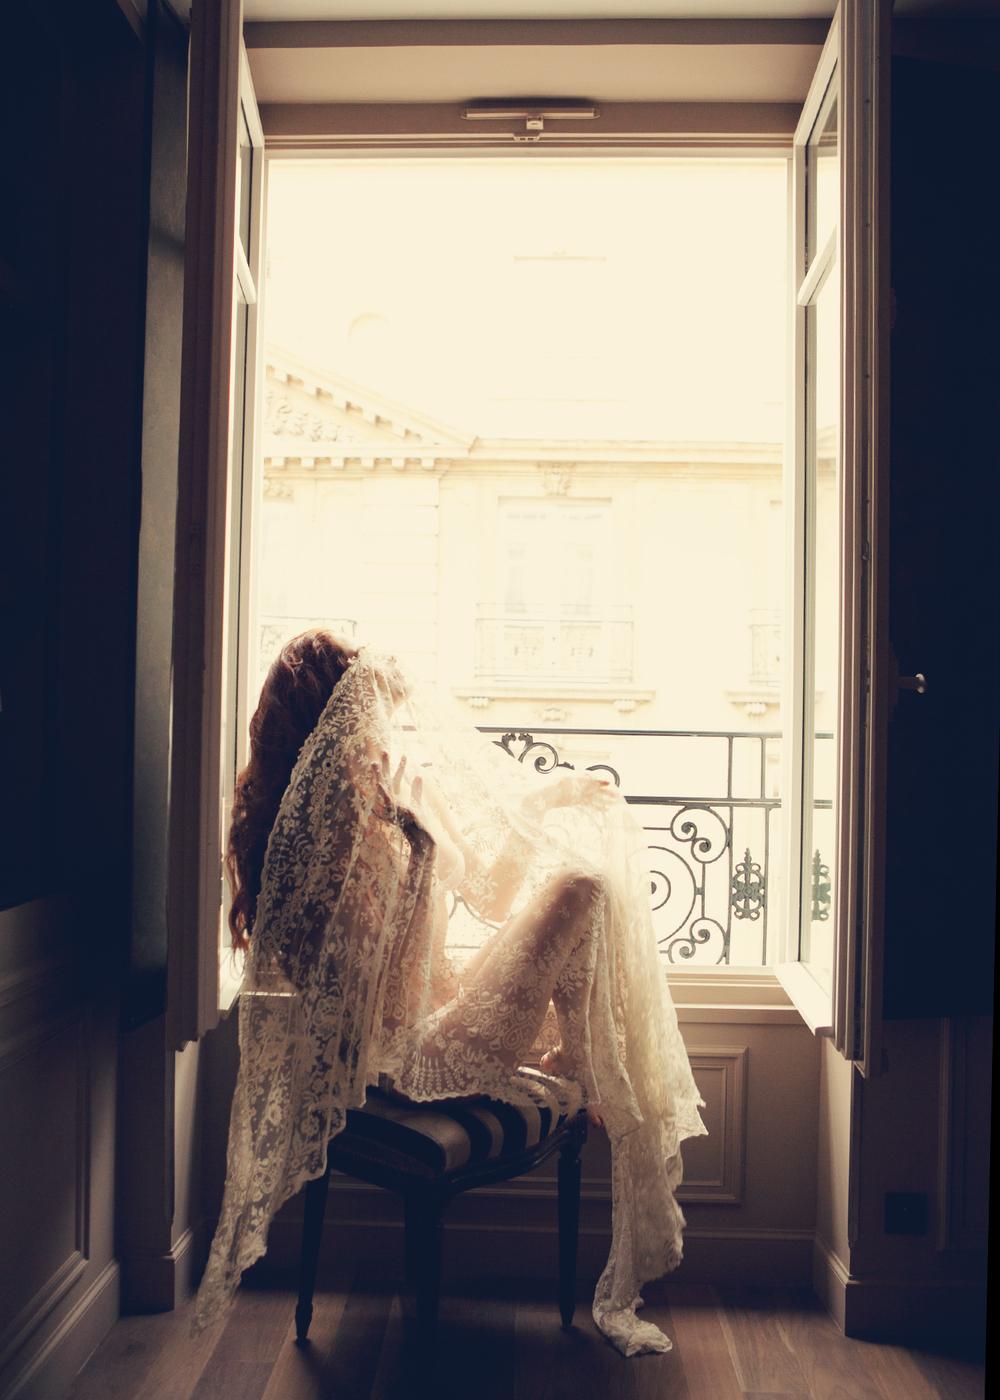 The LANE-Bridal-Editorial-Paris-Karissa-Fanning-Lauren-Ross-vintage-lace-veil.jpg